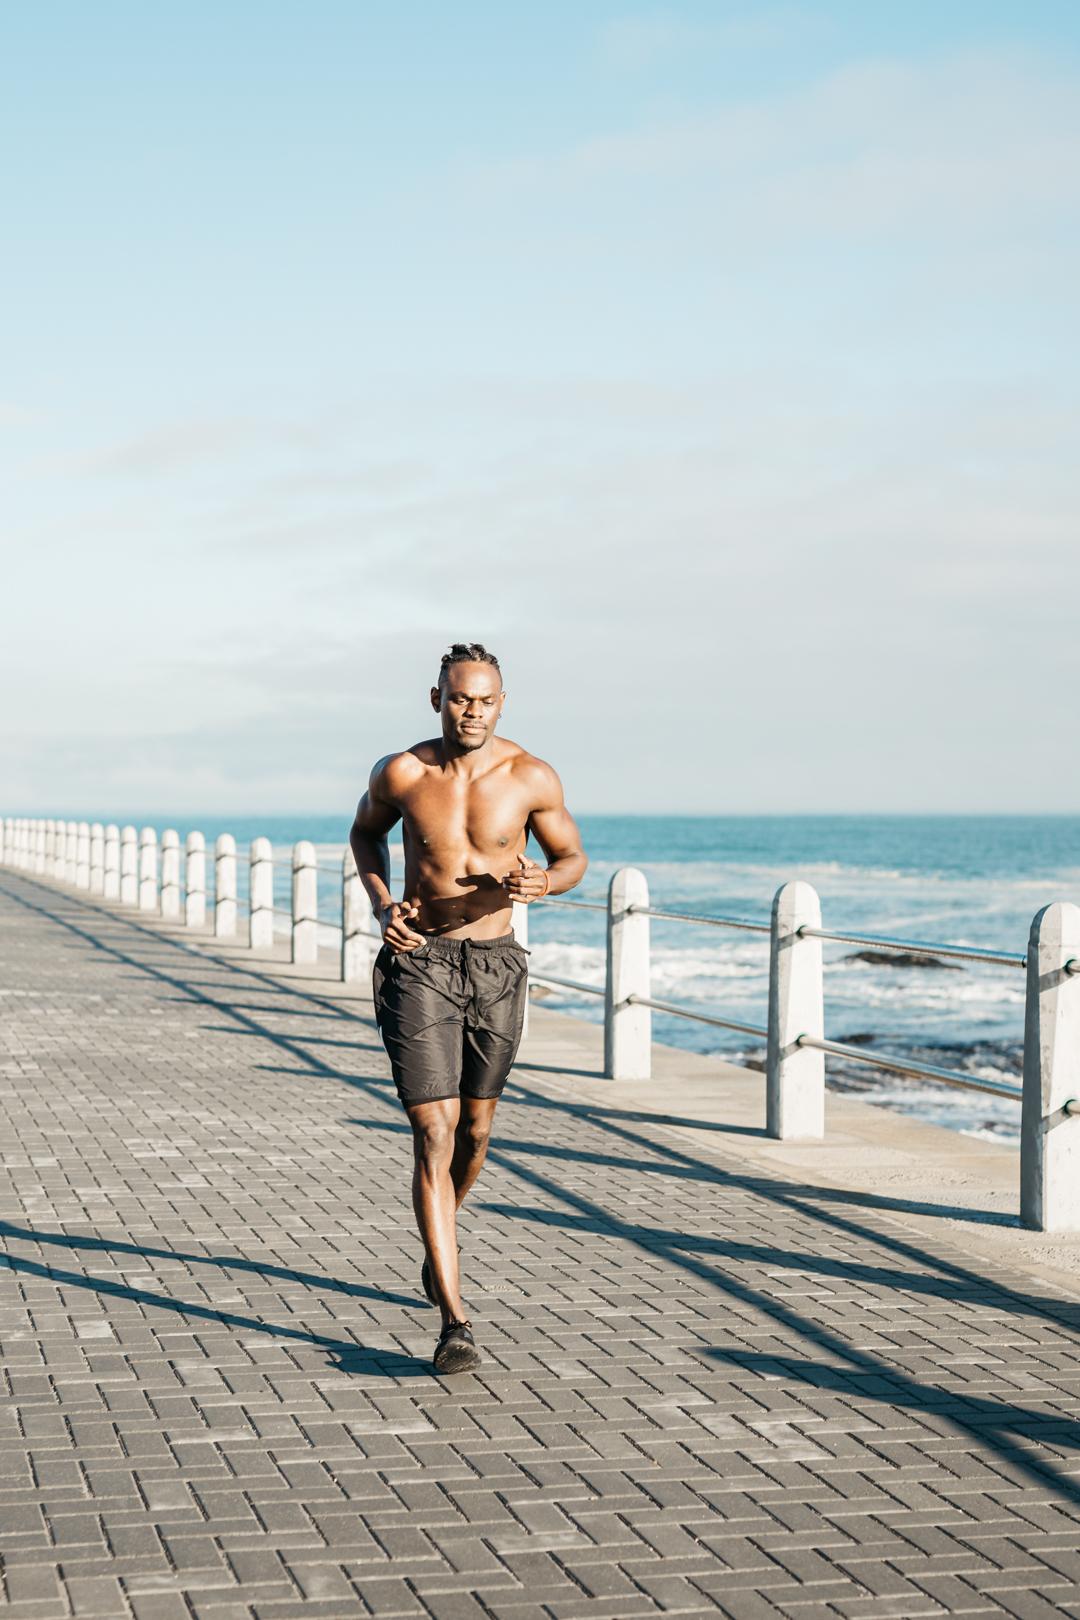 Fitness Portrait Photography Jose Bin - Cape Town Model - by Cape Image Co-43.jpg